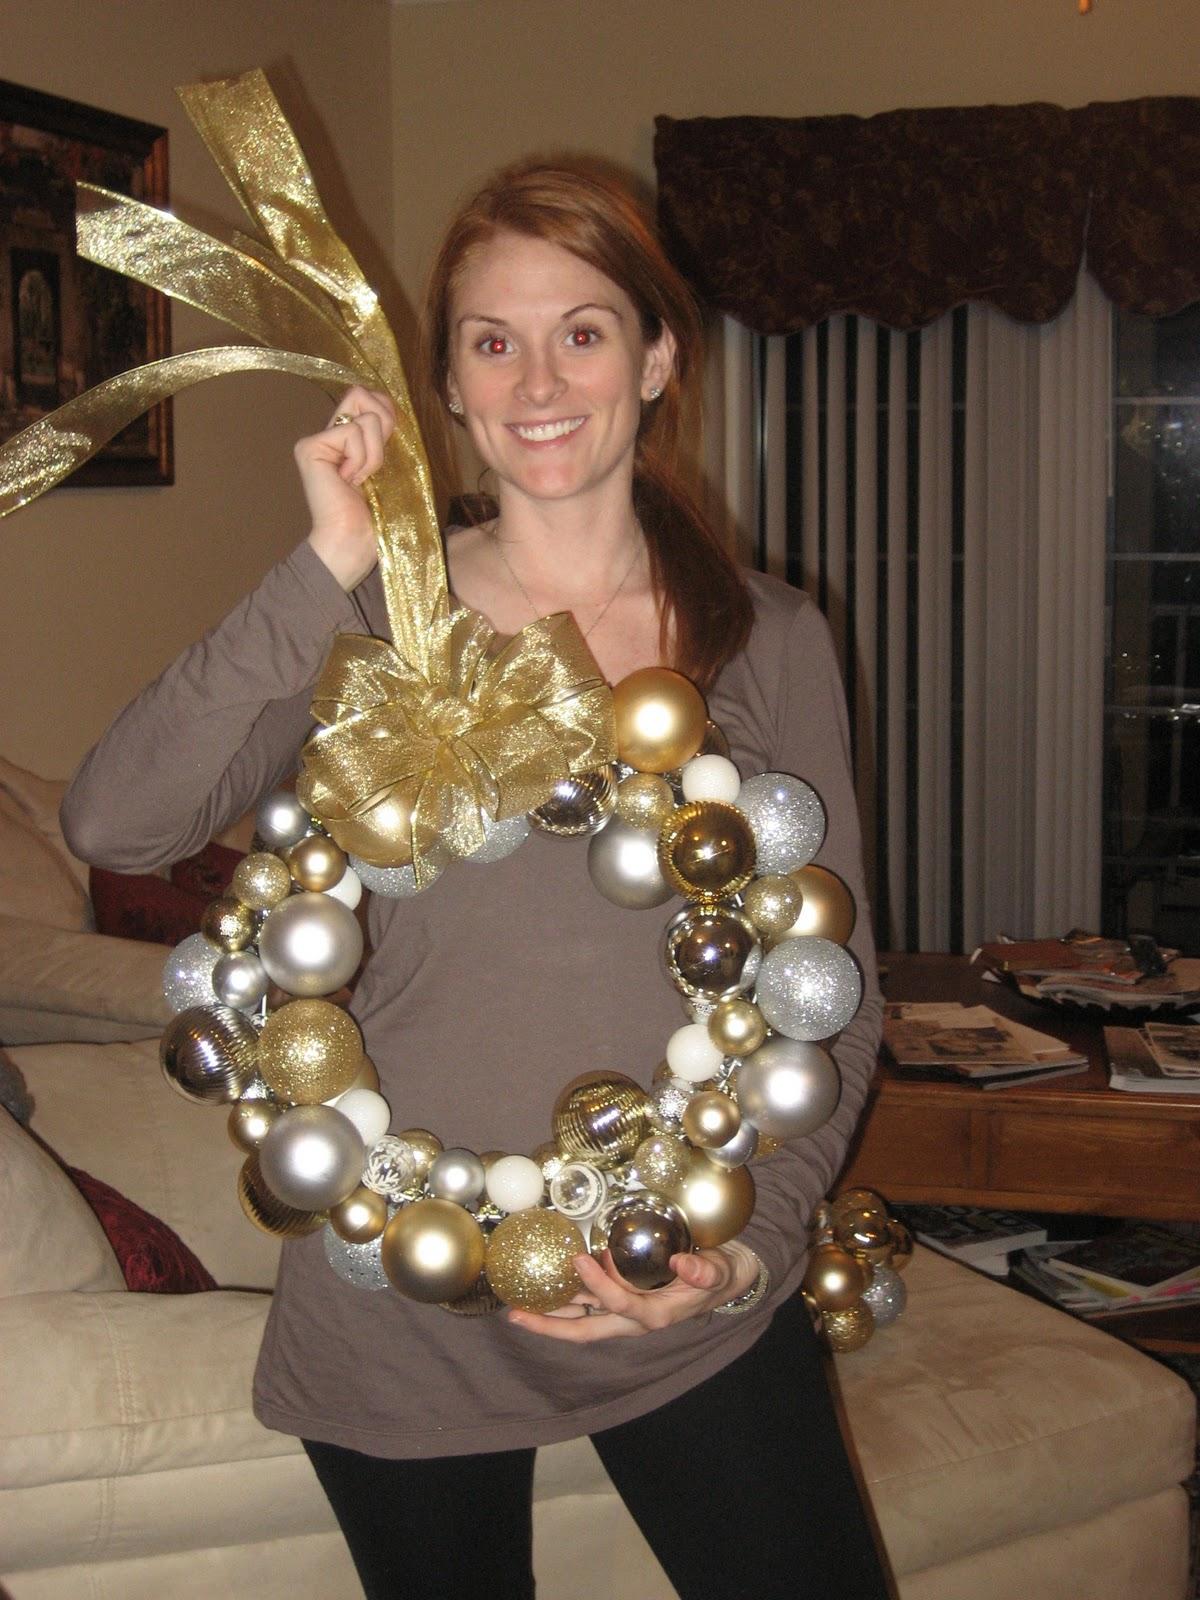 DIY Christmas Ornament Wreath – Comfy Cozy Couture